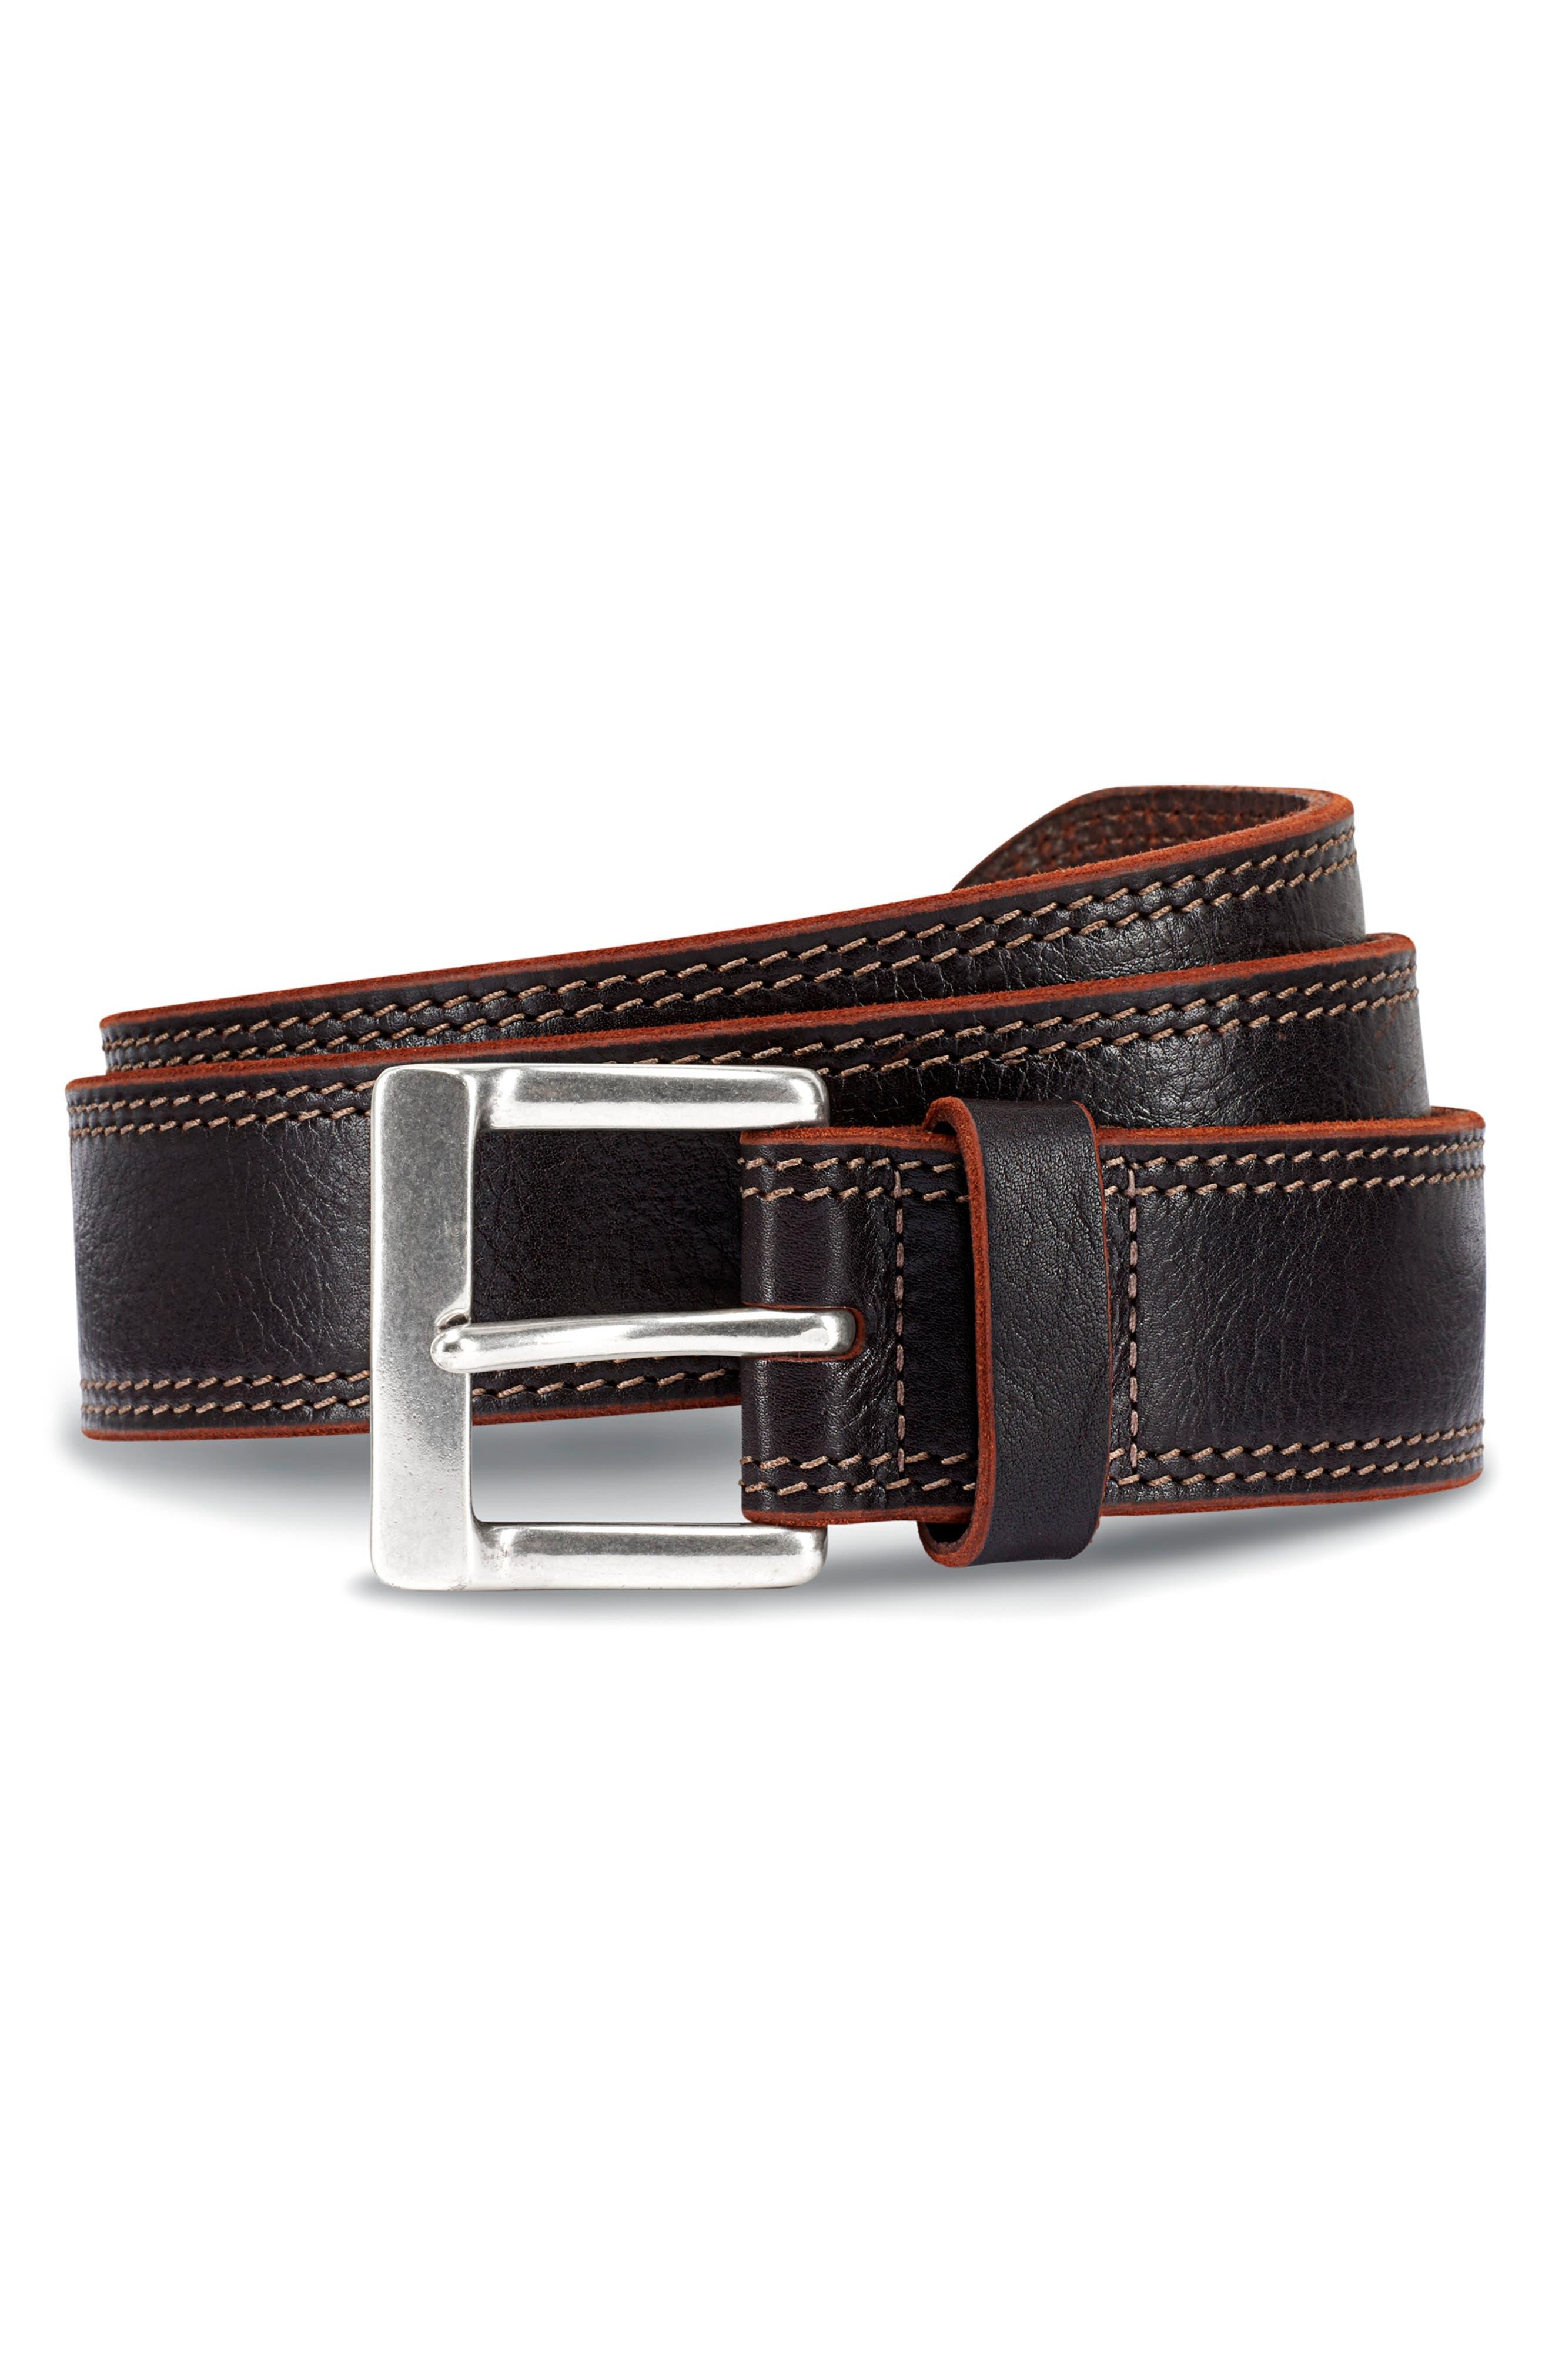 Allen Edmonds Quay Avenue Leather Belt, Dark Brown